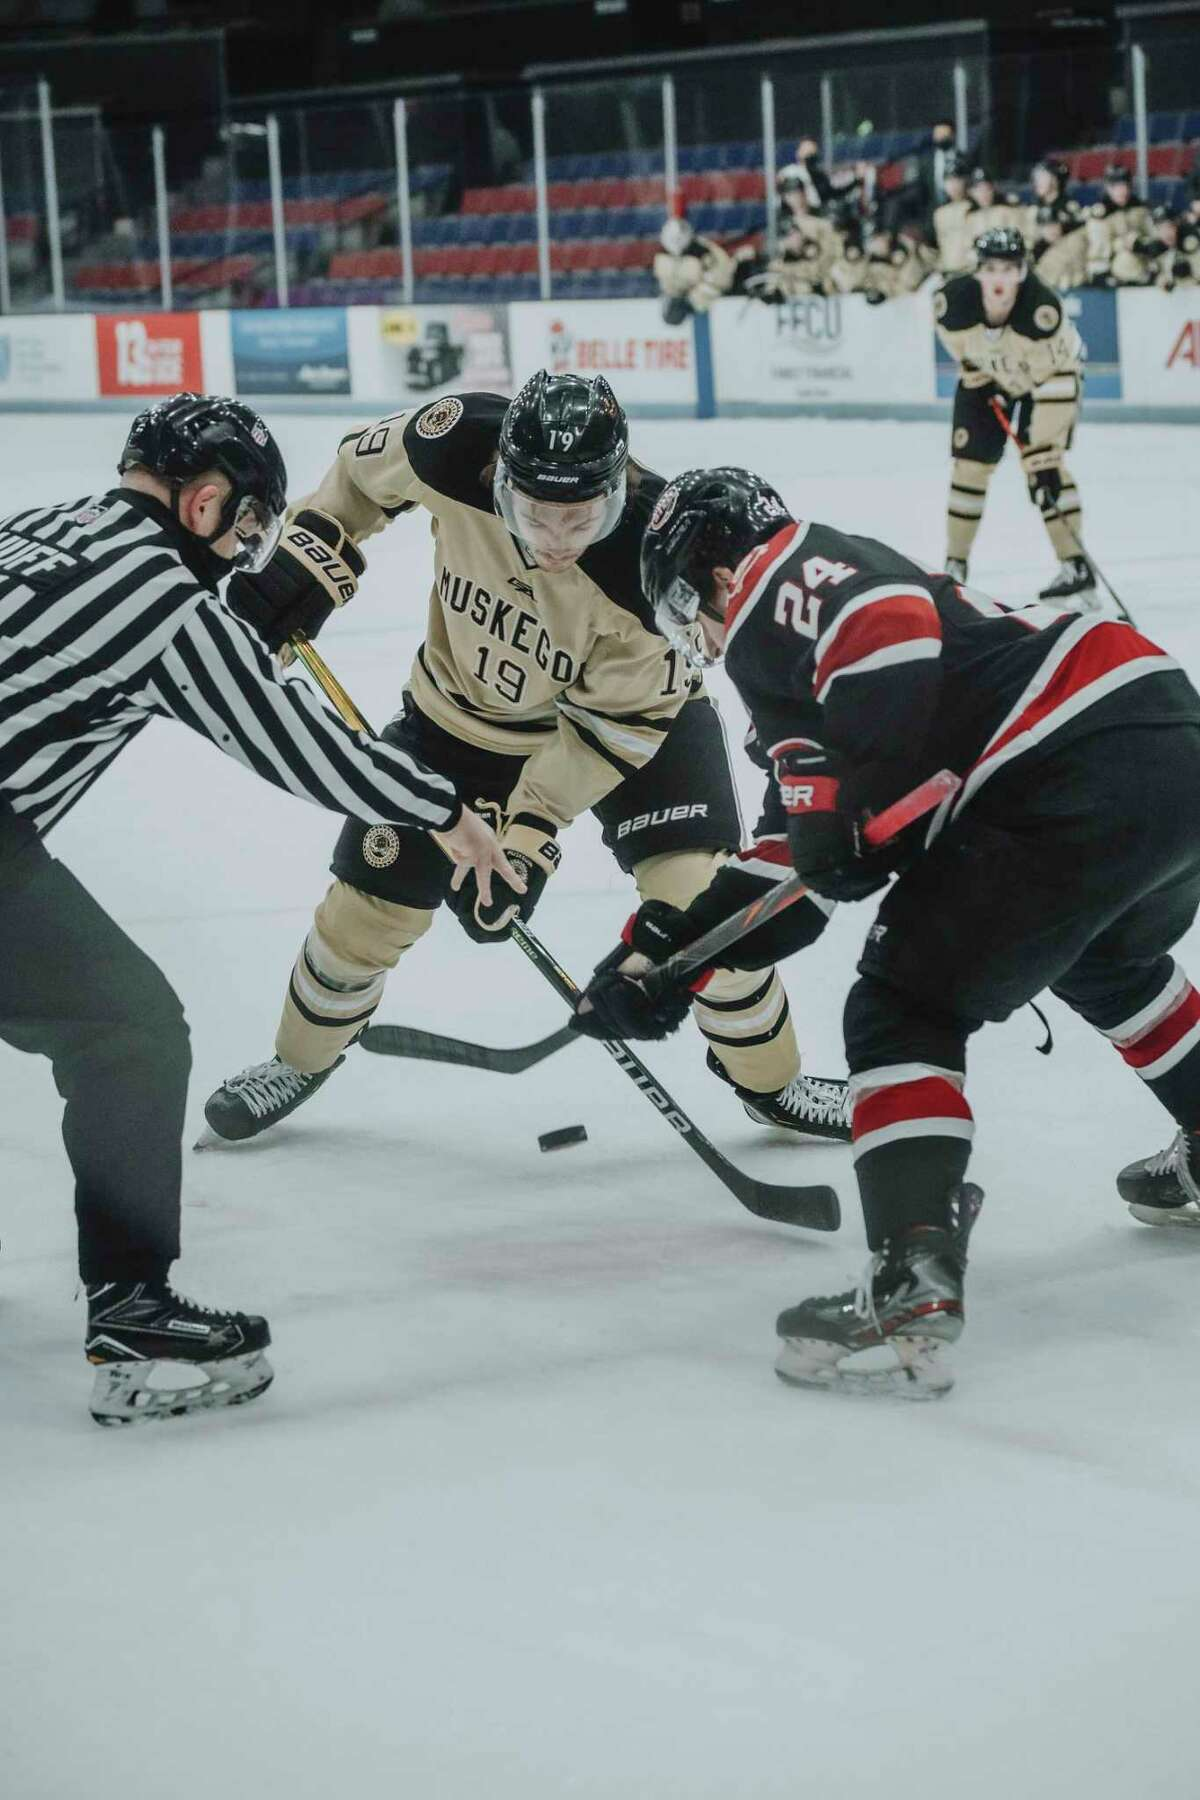 Big Rapids' Bradley Marek (19) is playing the Muskegon Lumberjacks with the USHL and will be joining Ferris State's hockey program next season. (Photo courtesy of the Muskegon Lumberjacks)